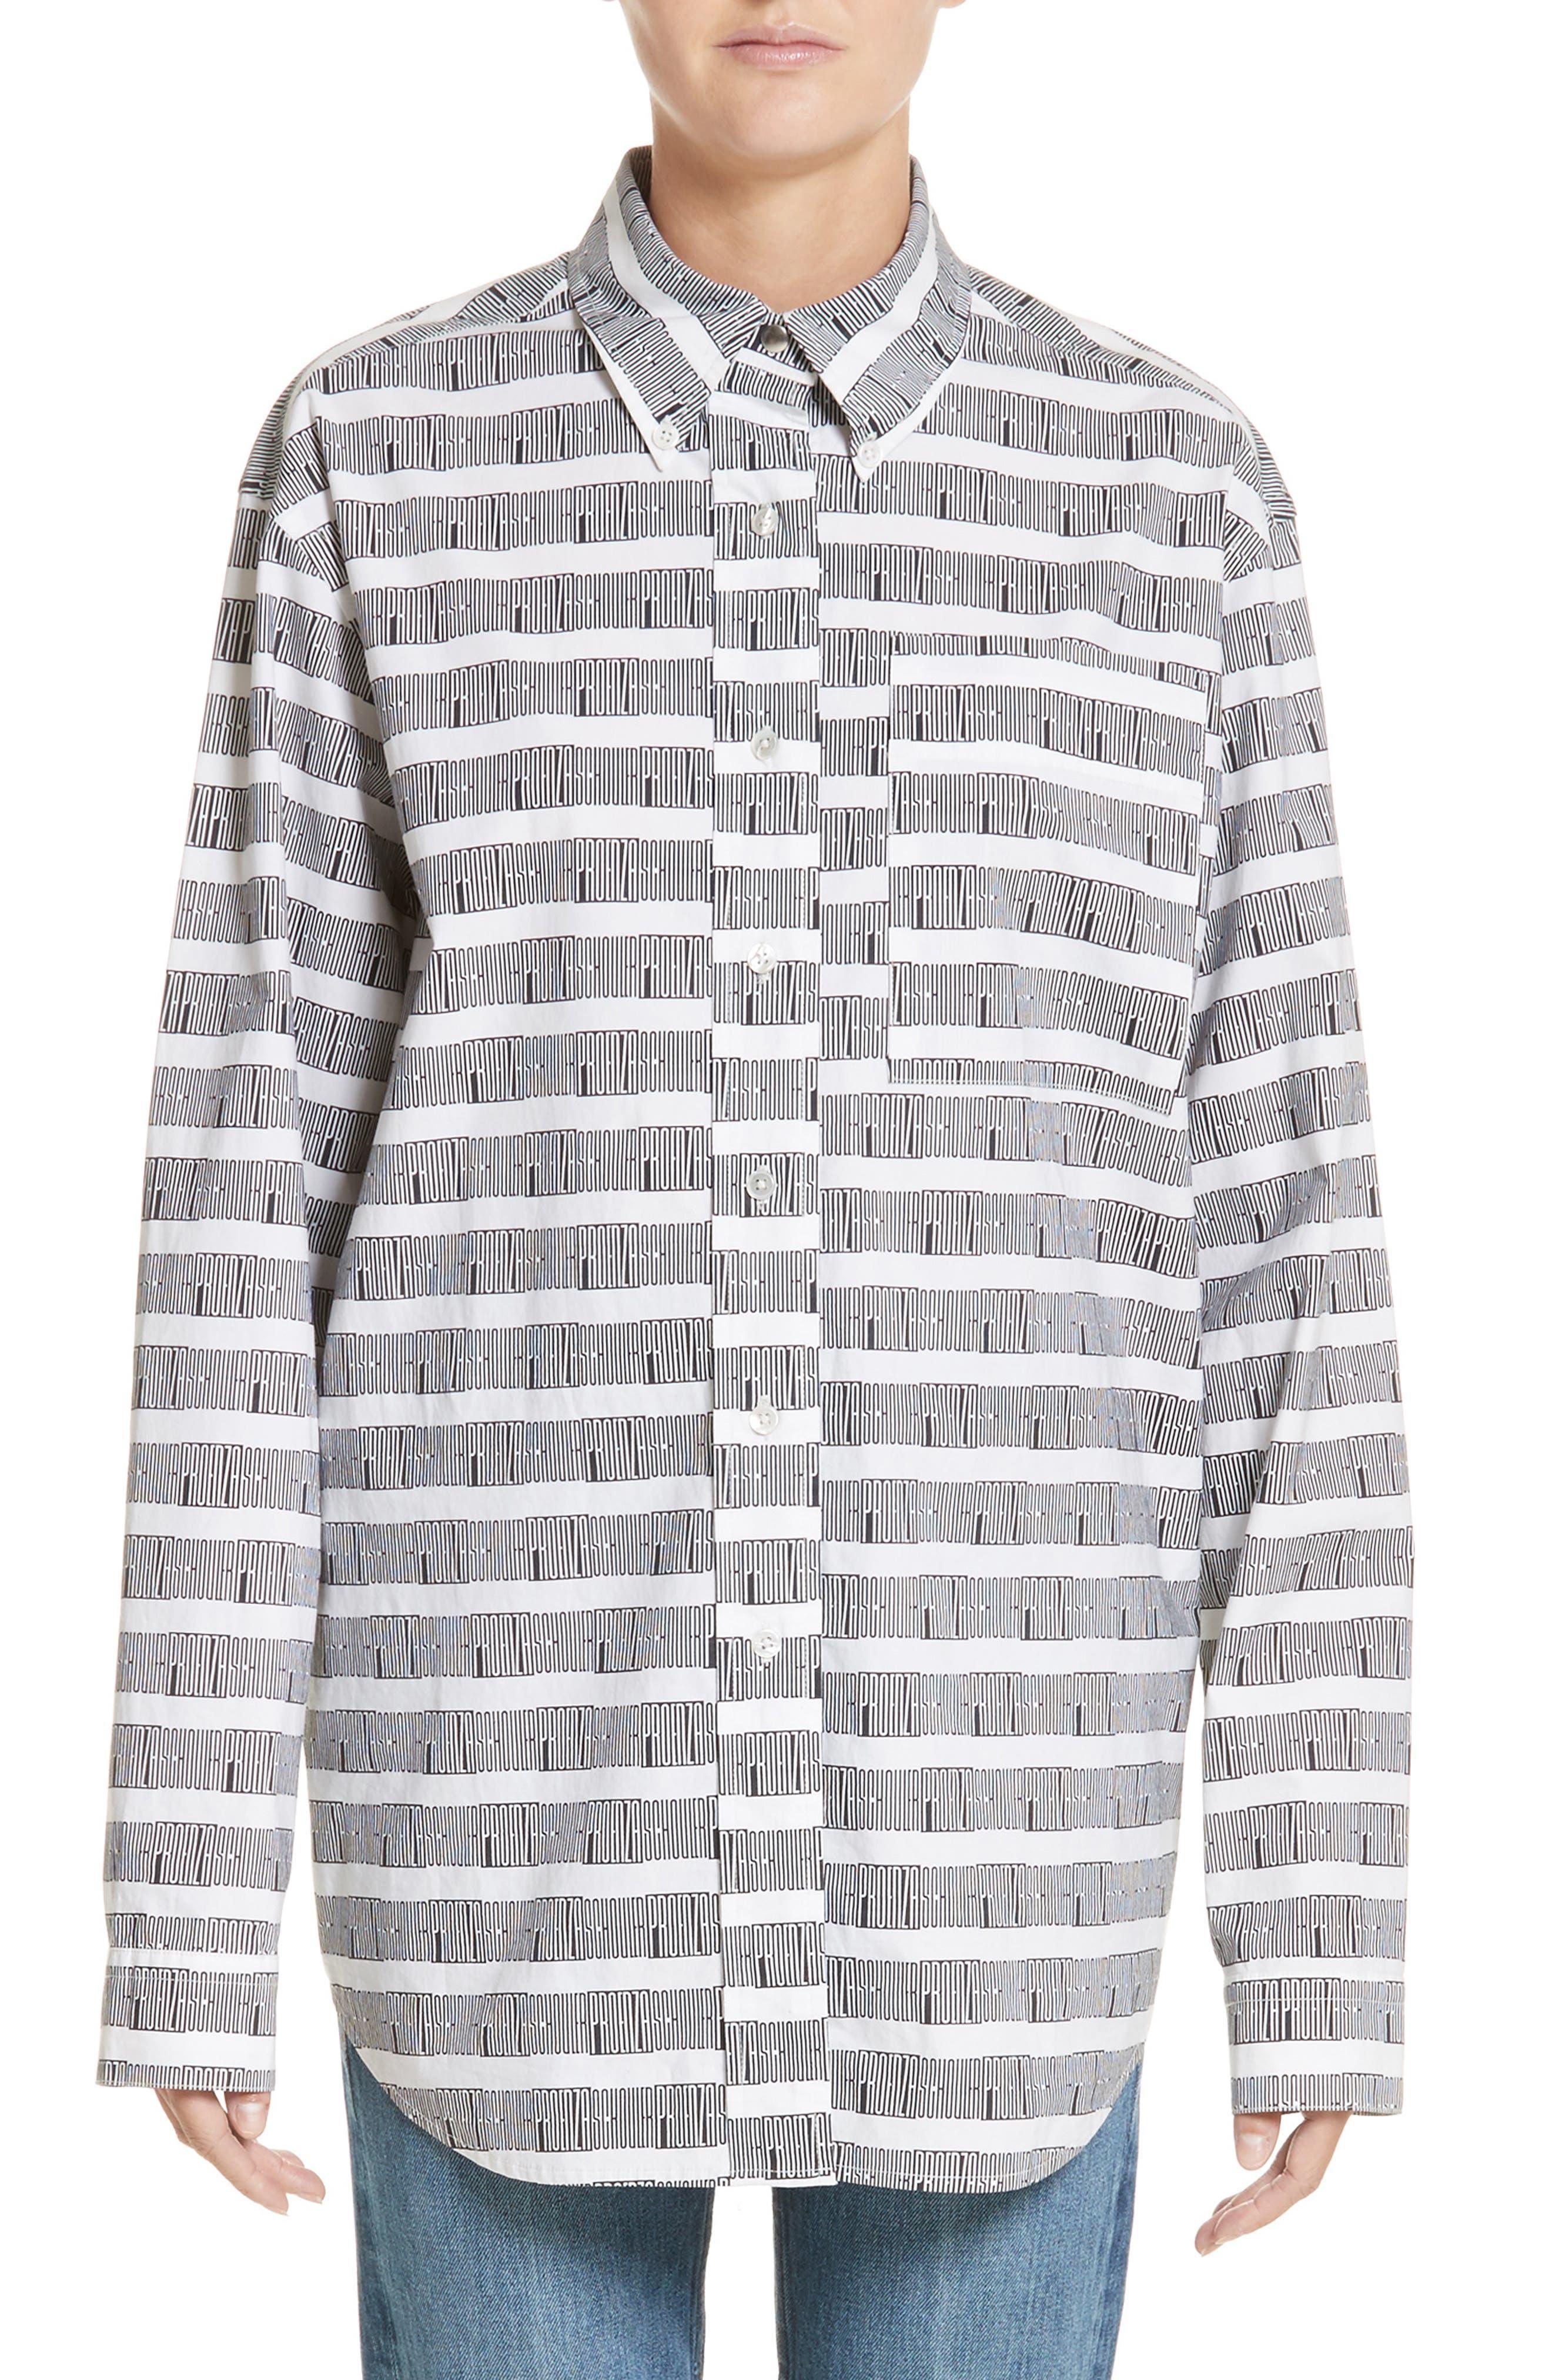 Proenza Schouler PSWL Graphic Stripe Cotton Top